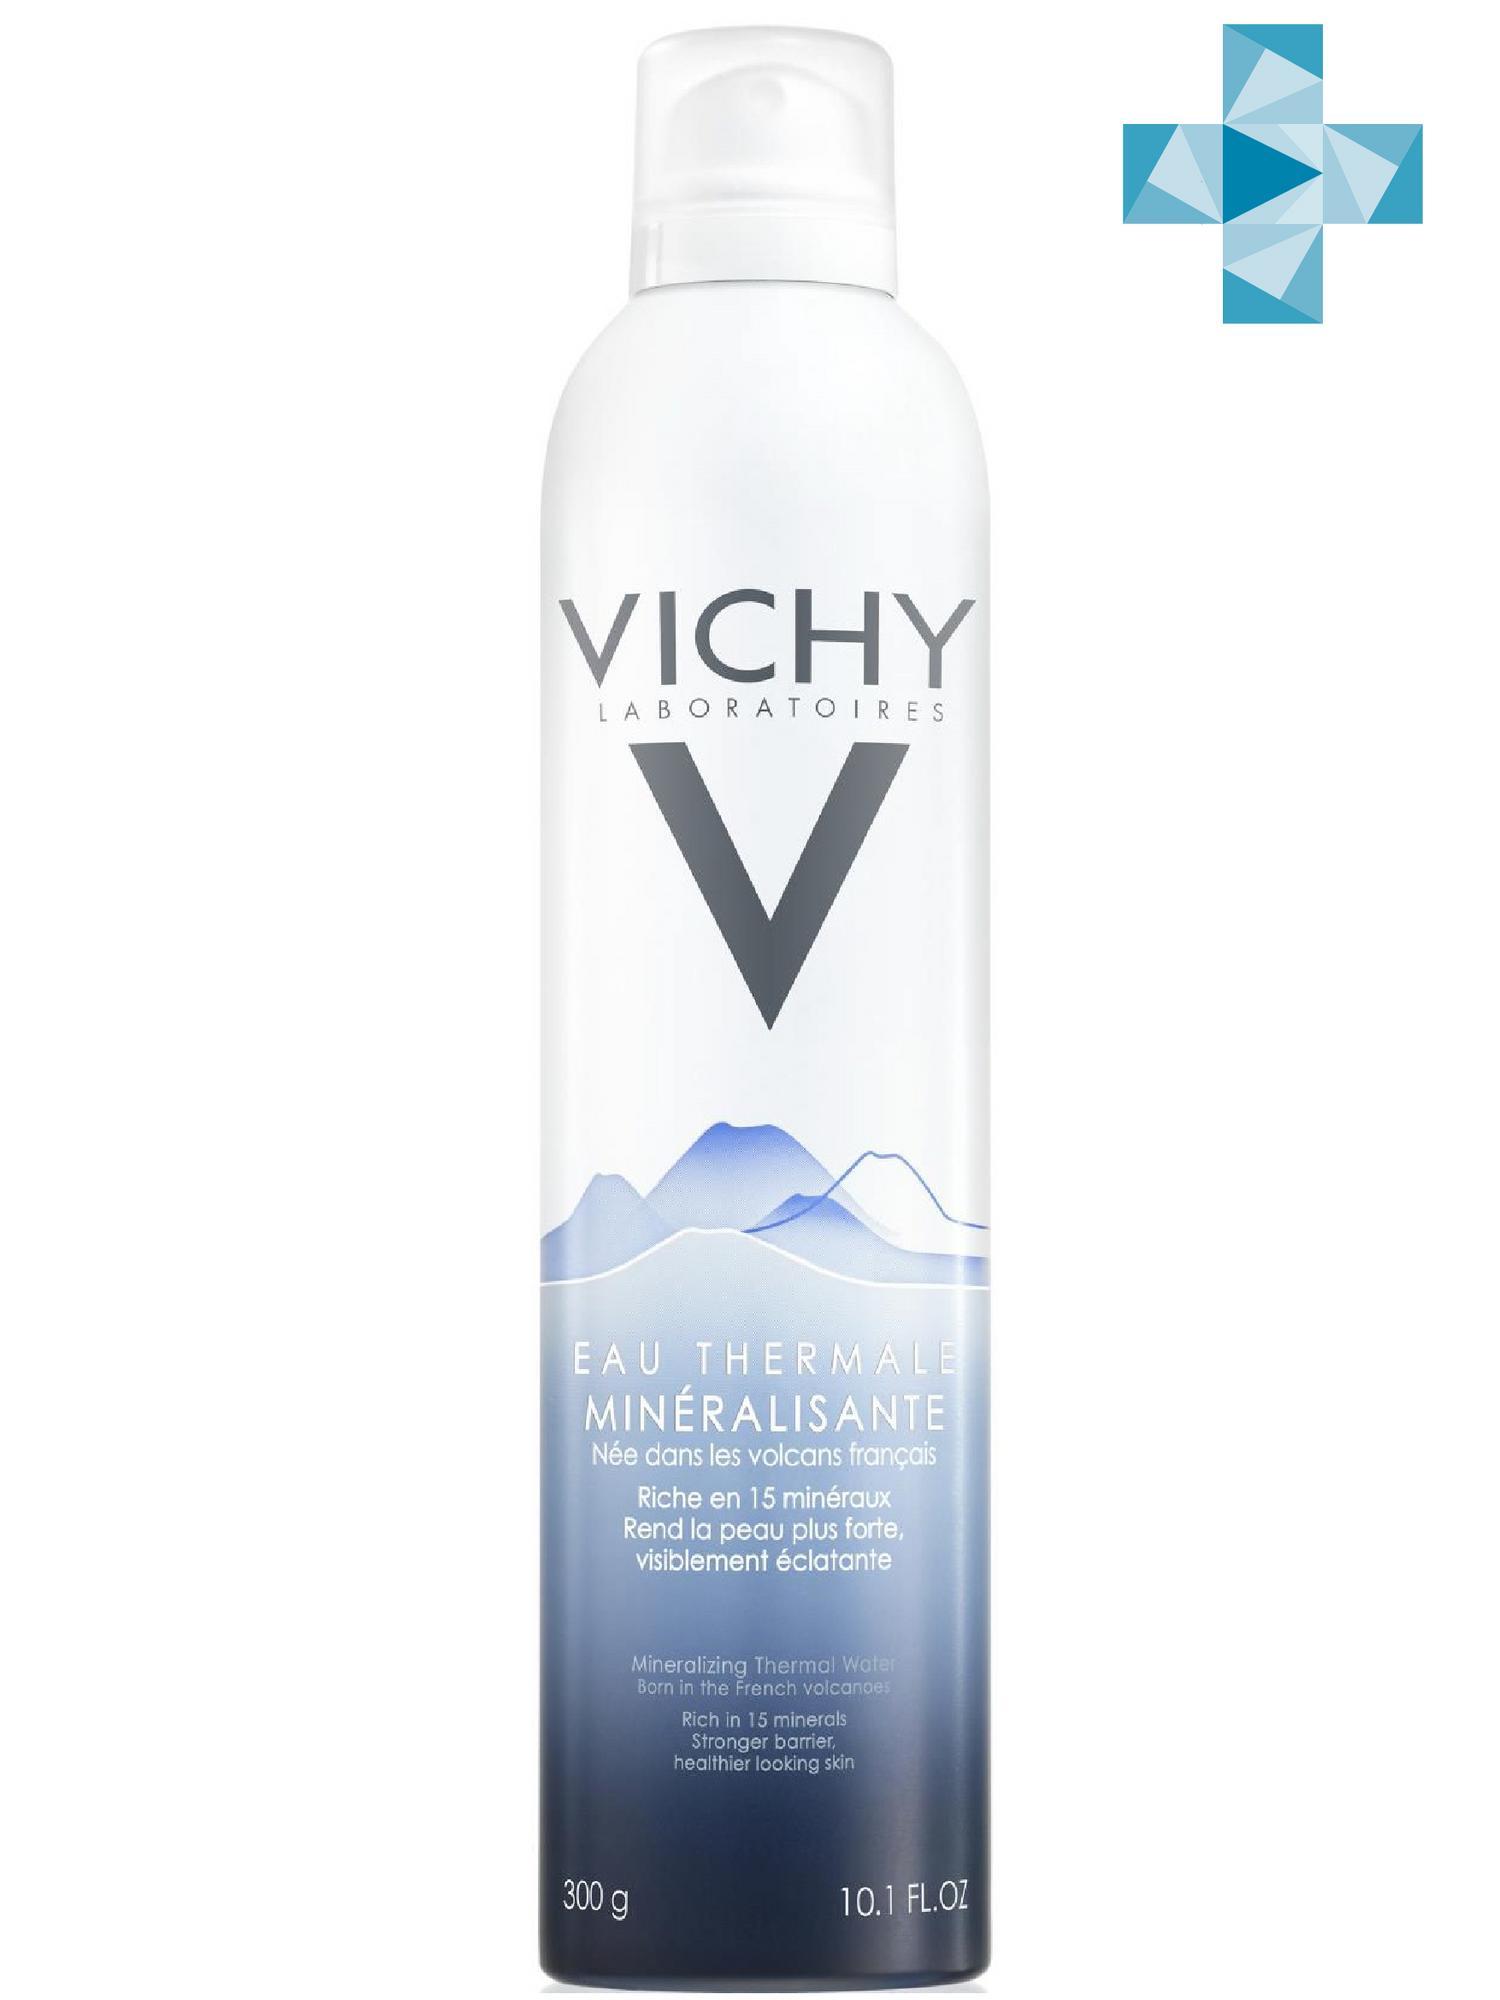 Vichy Термальная Вода Vichy 300 мл (Vichy, Thermal Water Vichy)